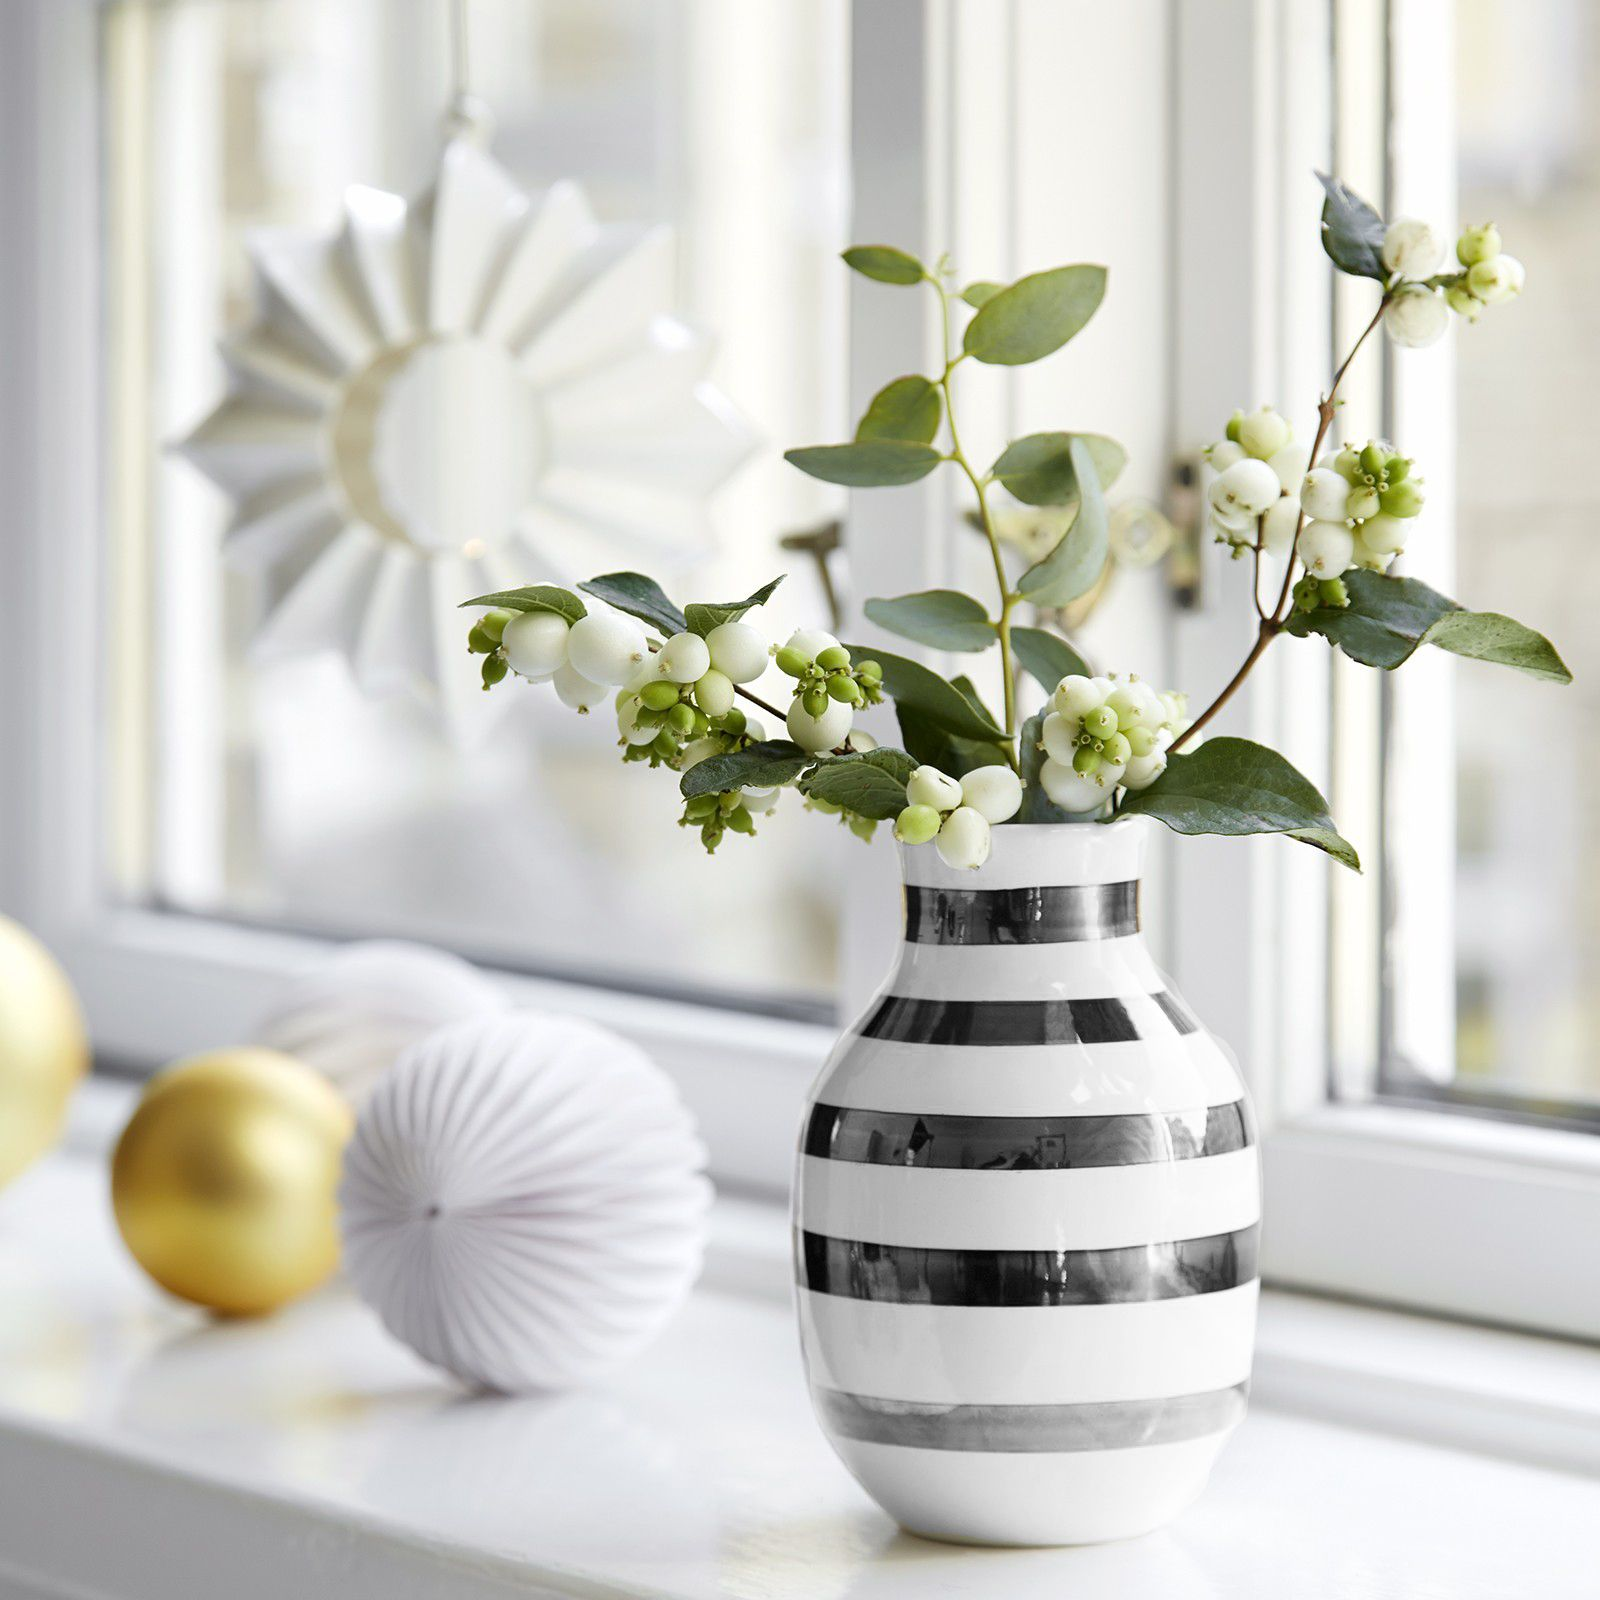 kahler omaggio vase silver small